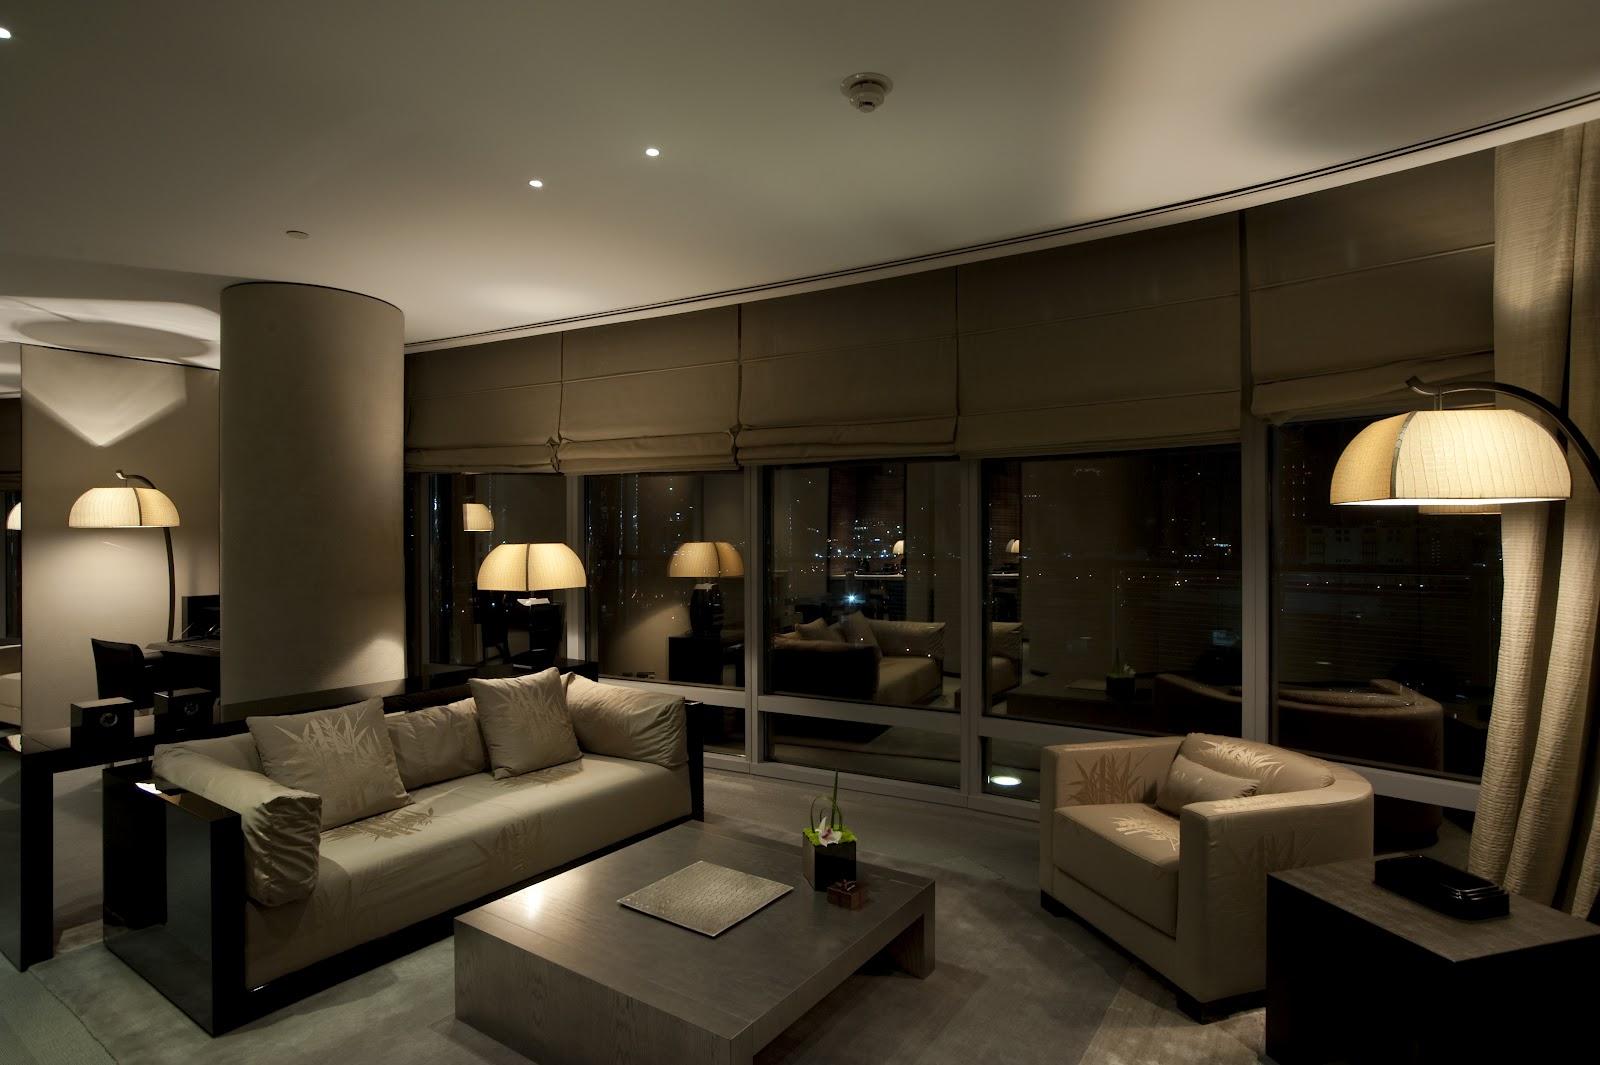 Passion for luxury armani hotel in dubai burj khalifa tower for Armani hotel